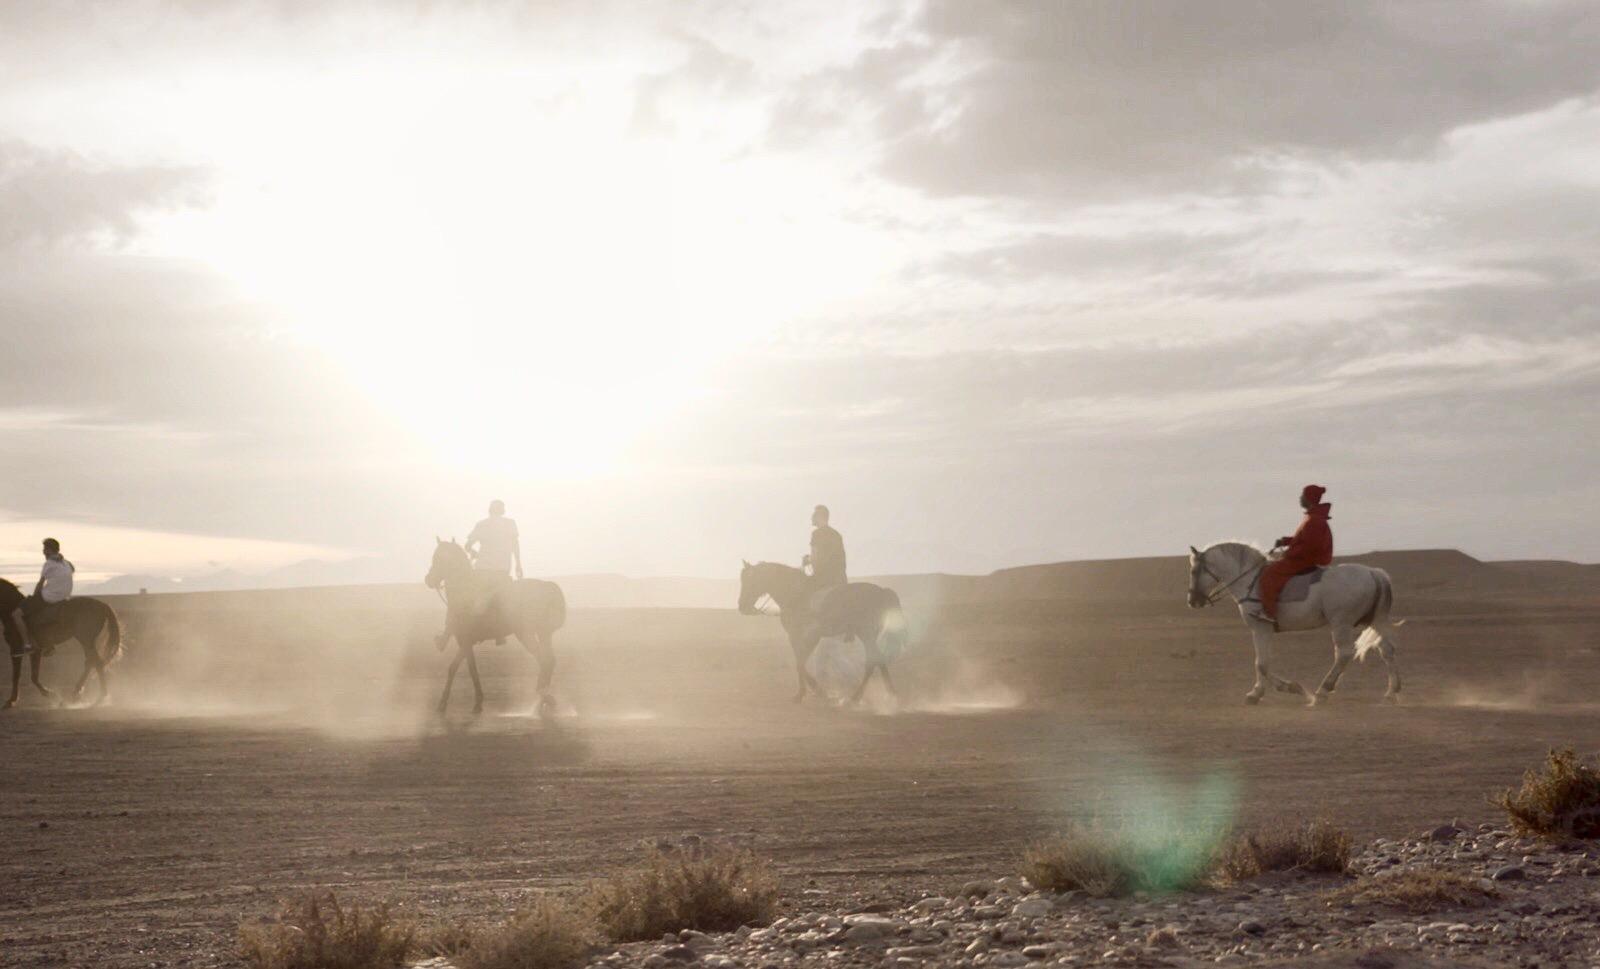 Desert Riders. Igloo Hong, Sahara Desert, Morocco